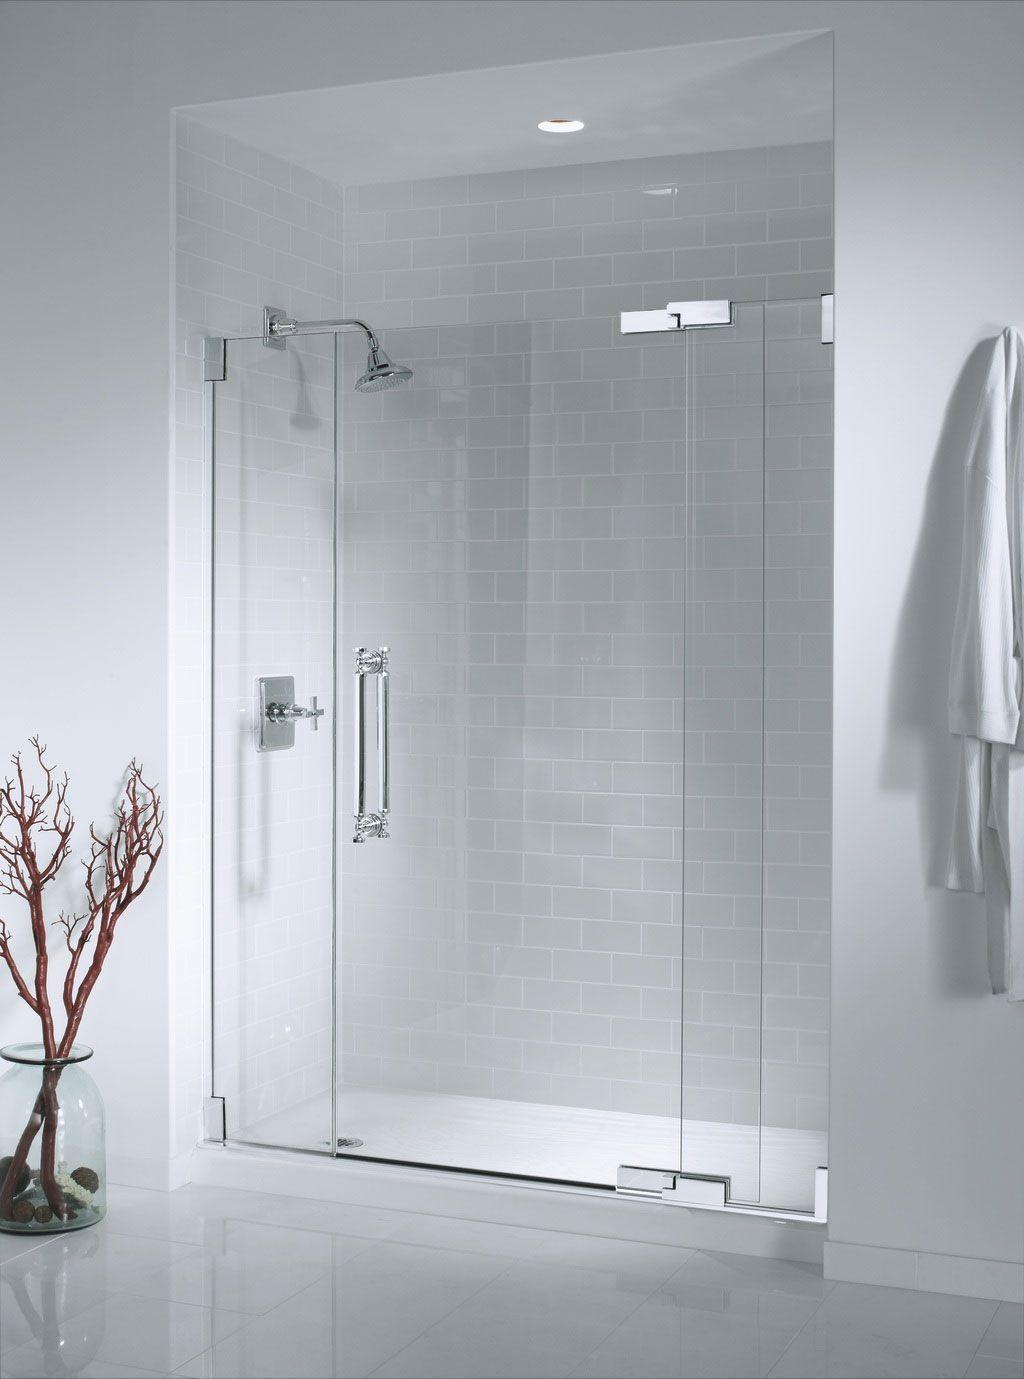 modern frameless shower doors. Bathroom Interior, Glass Shower Doors \u2013 The Affection Of Modernity: Nice Modern Frameless L